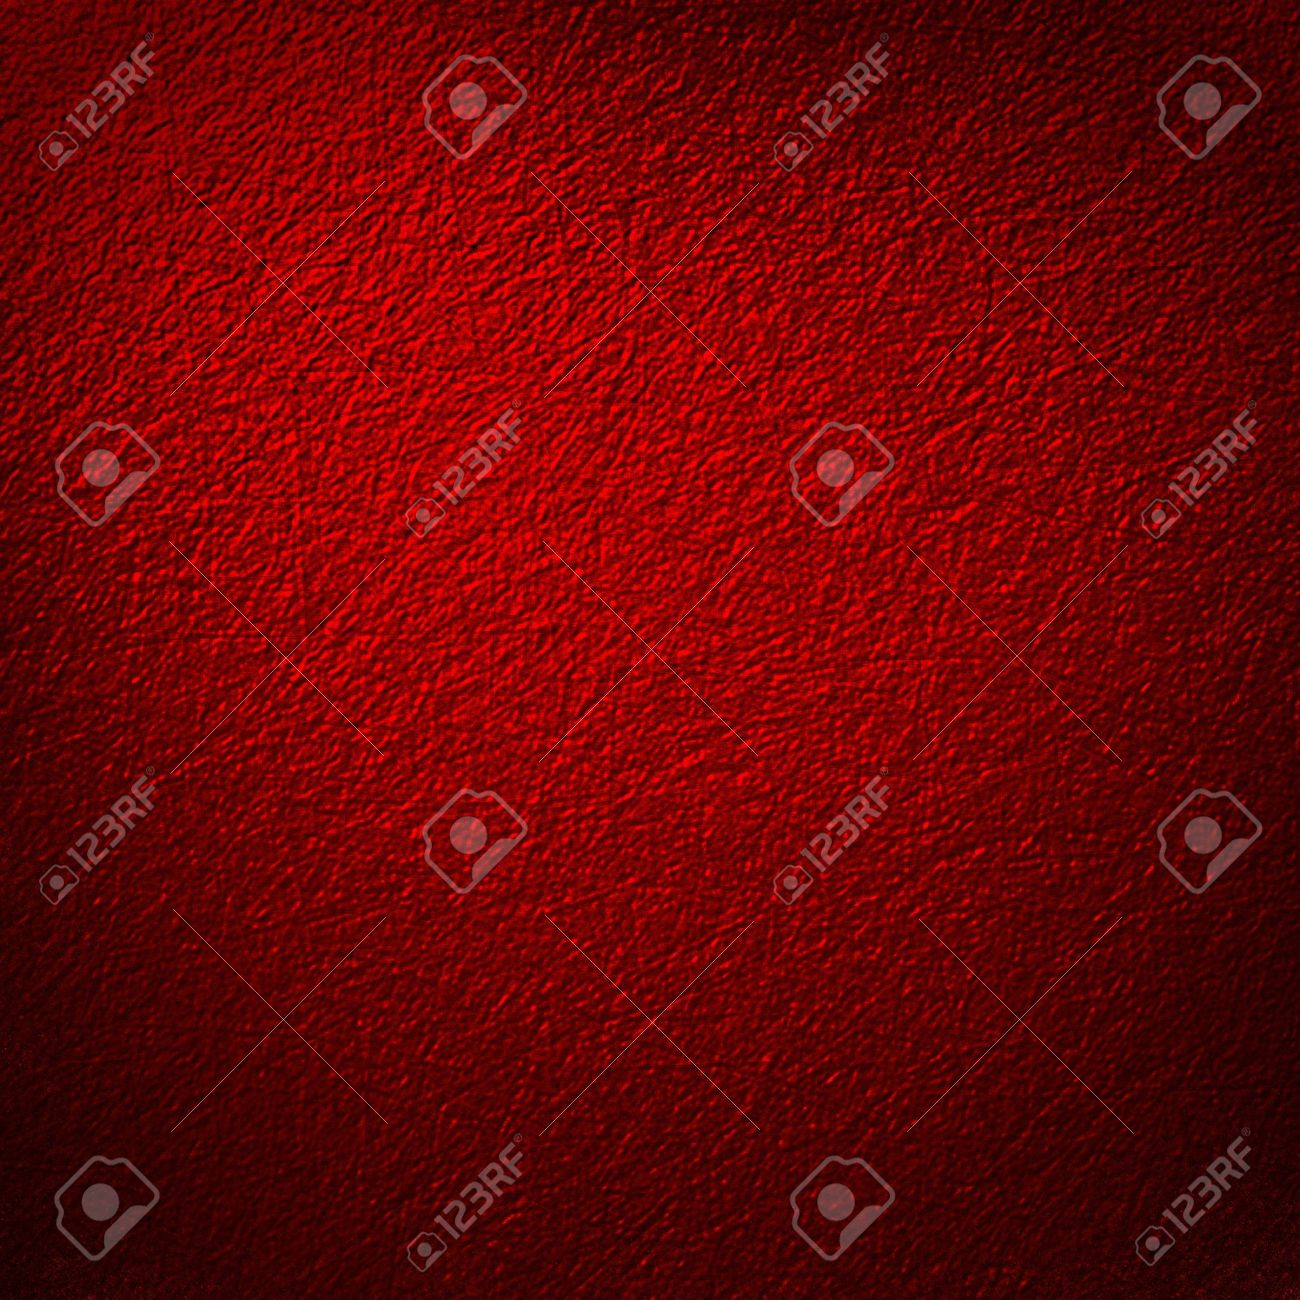 Dark Red Background Old Paper On Vintage Grunge Texture Design Of Black Edges Abstract